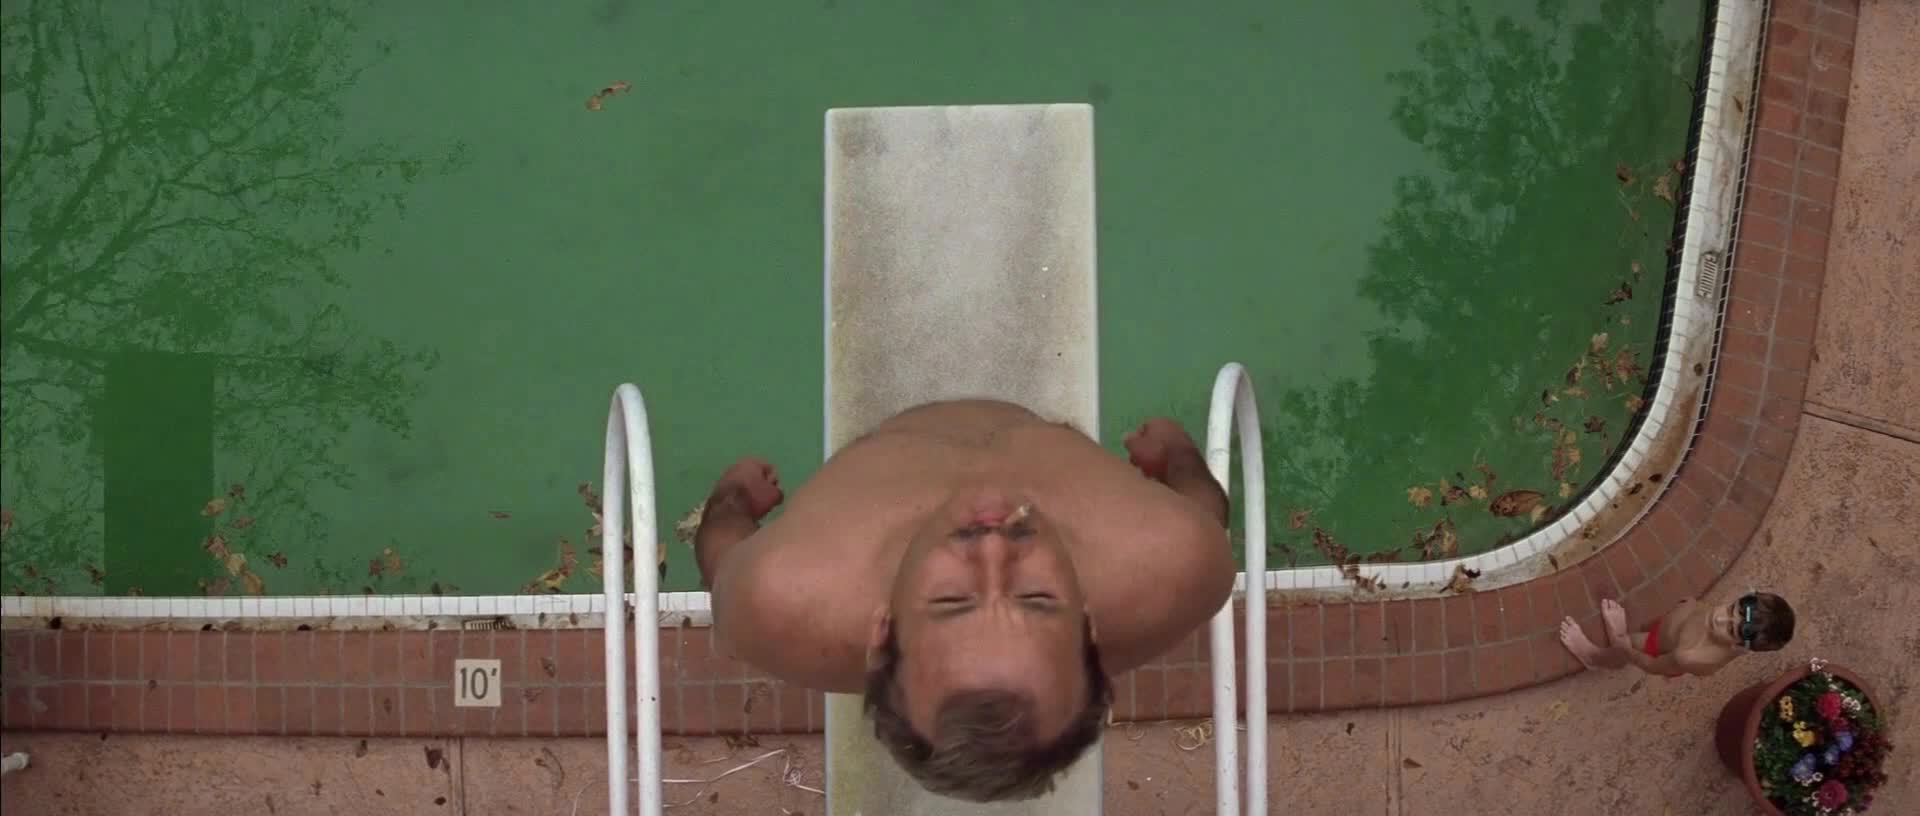 cinemagraphs, Pool GIFs